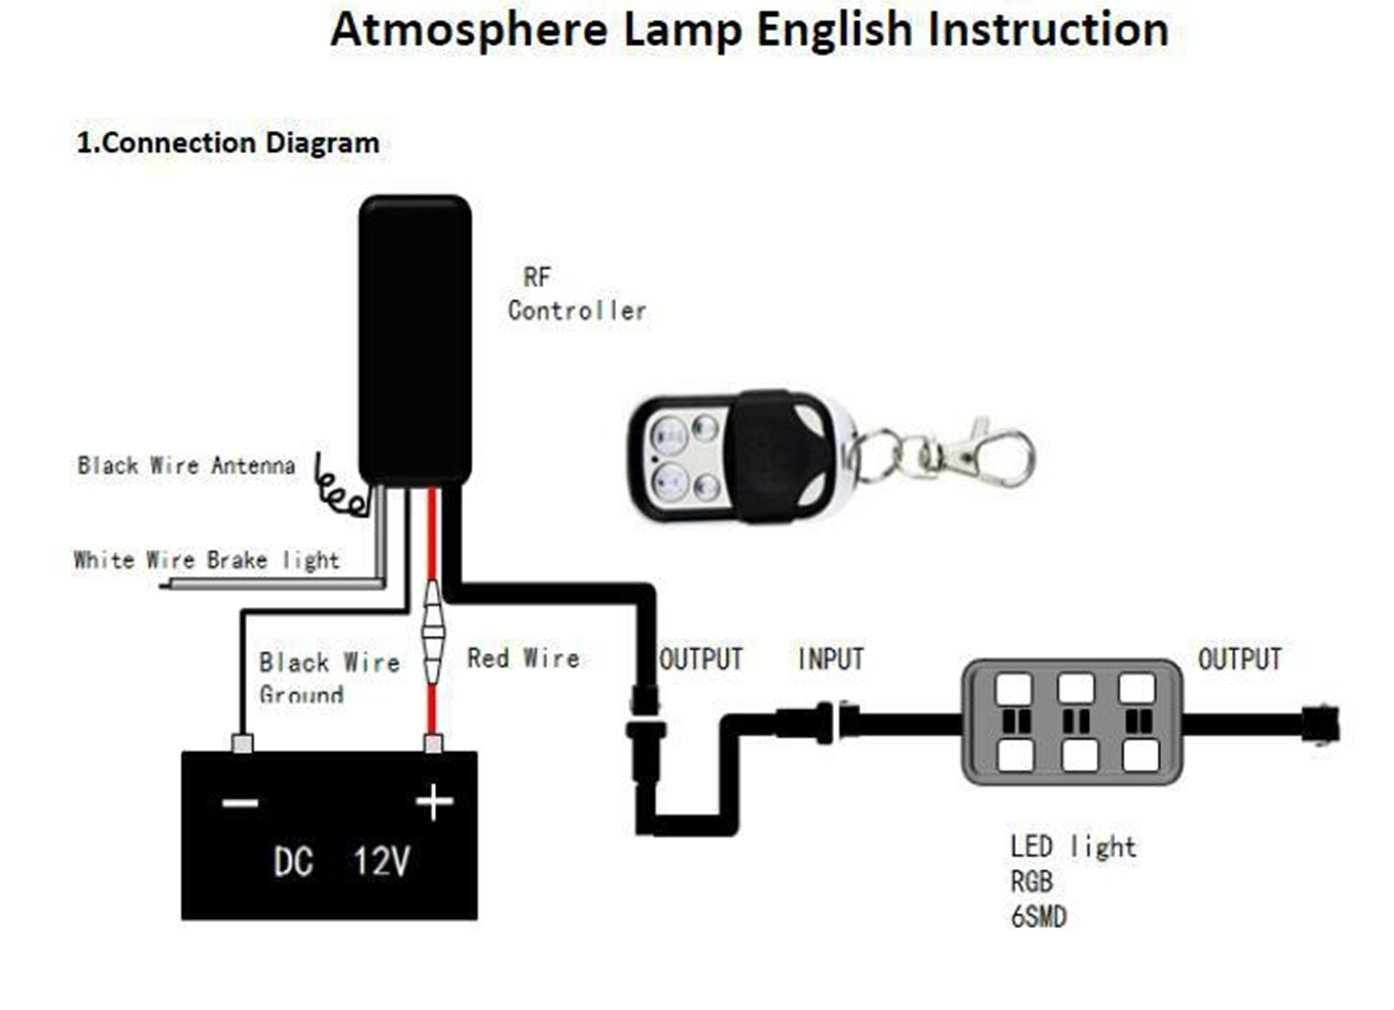 Lamp Ca Gps Wiring Diagram - Wiring Diagrams The Ca Lamp G Wiring Diagram on